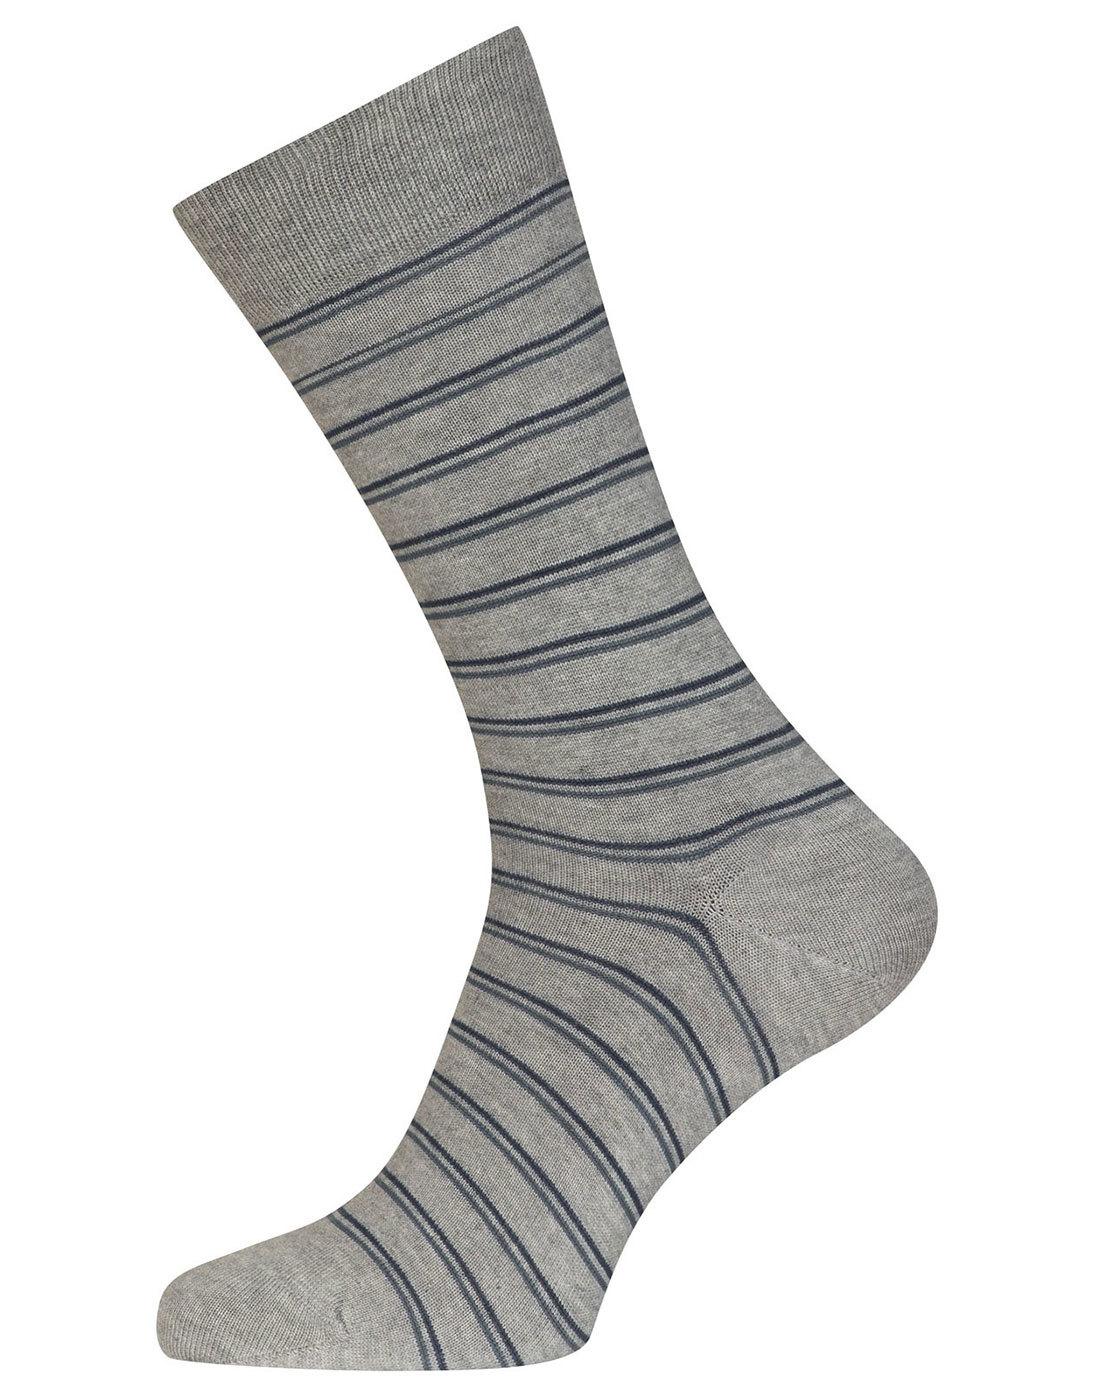 Epsilon JOHN SMEDLEY Made in England Striped Socks